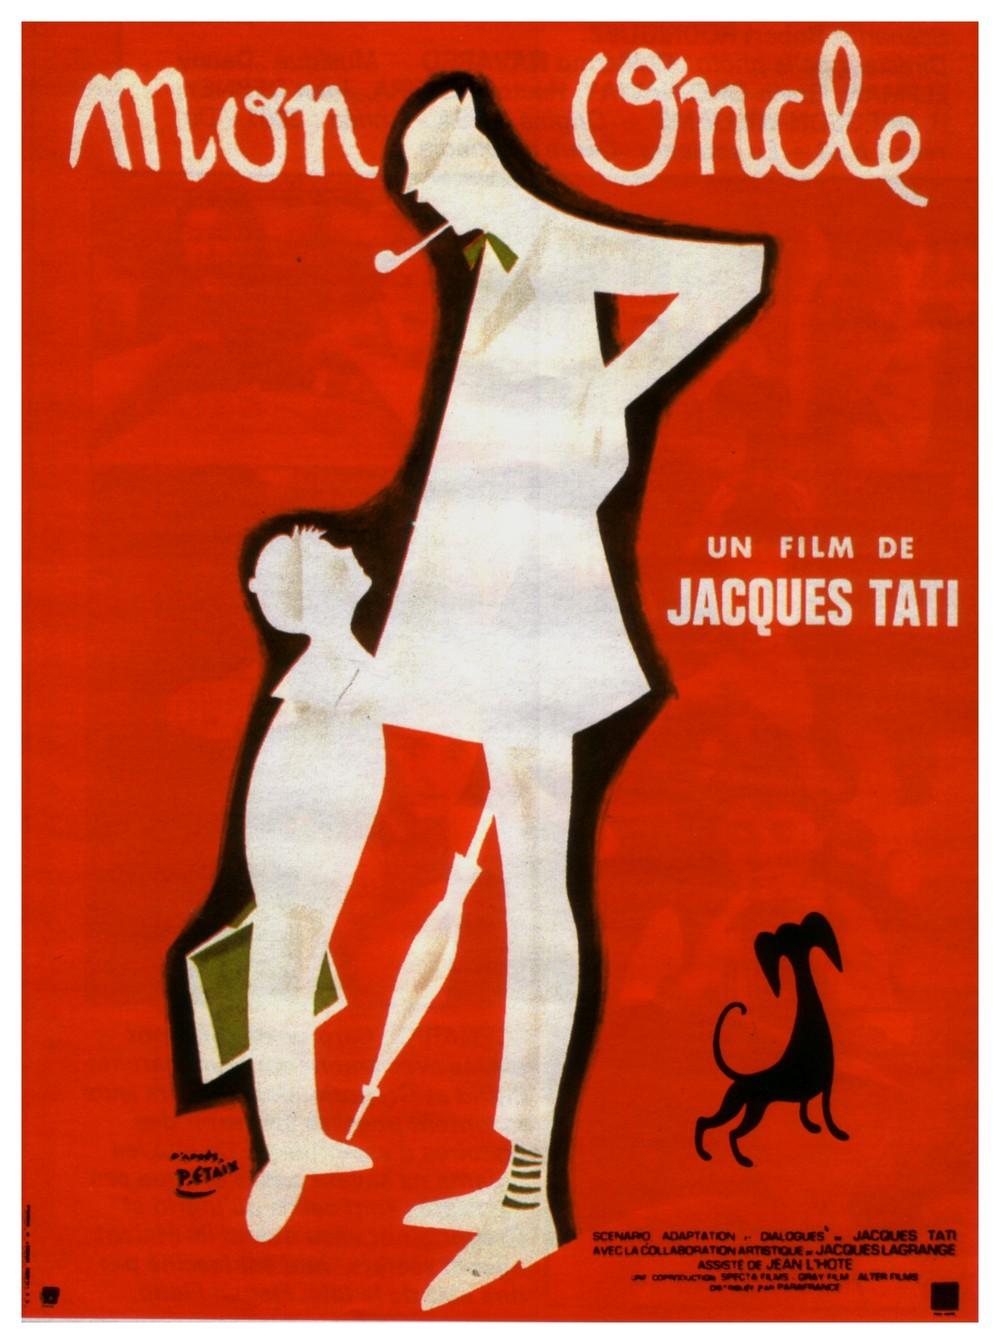 REEL CLASSICS: Mon Oncle (1958)